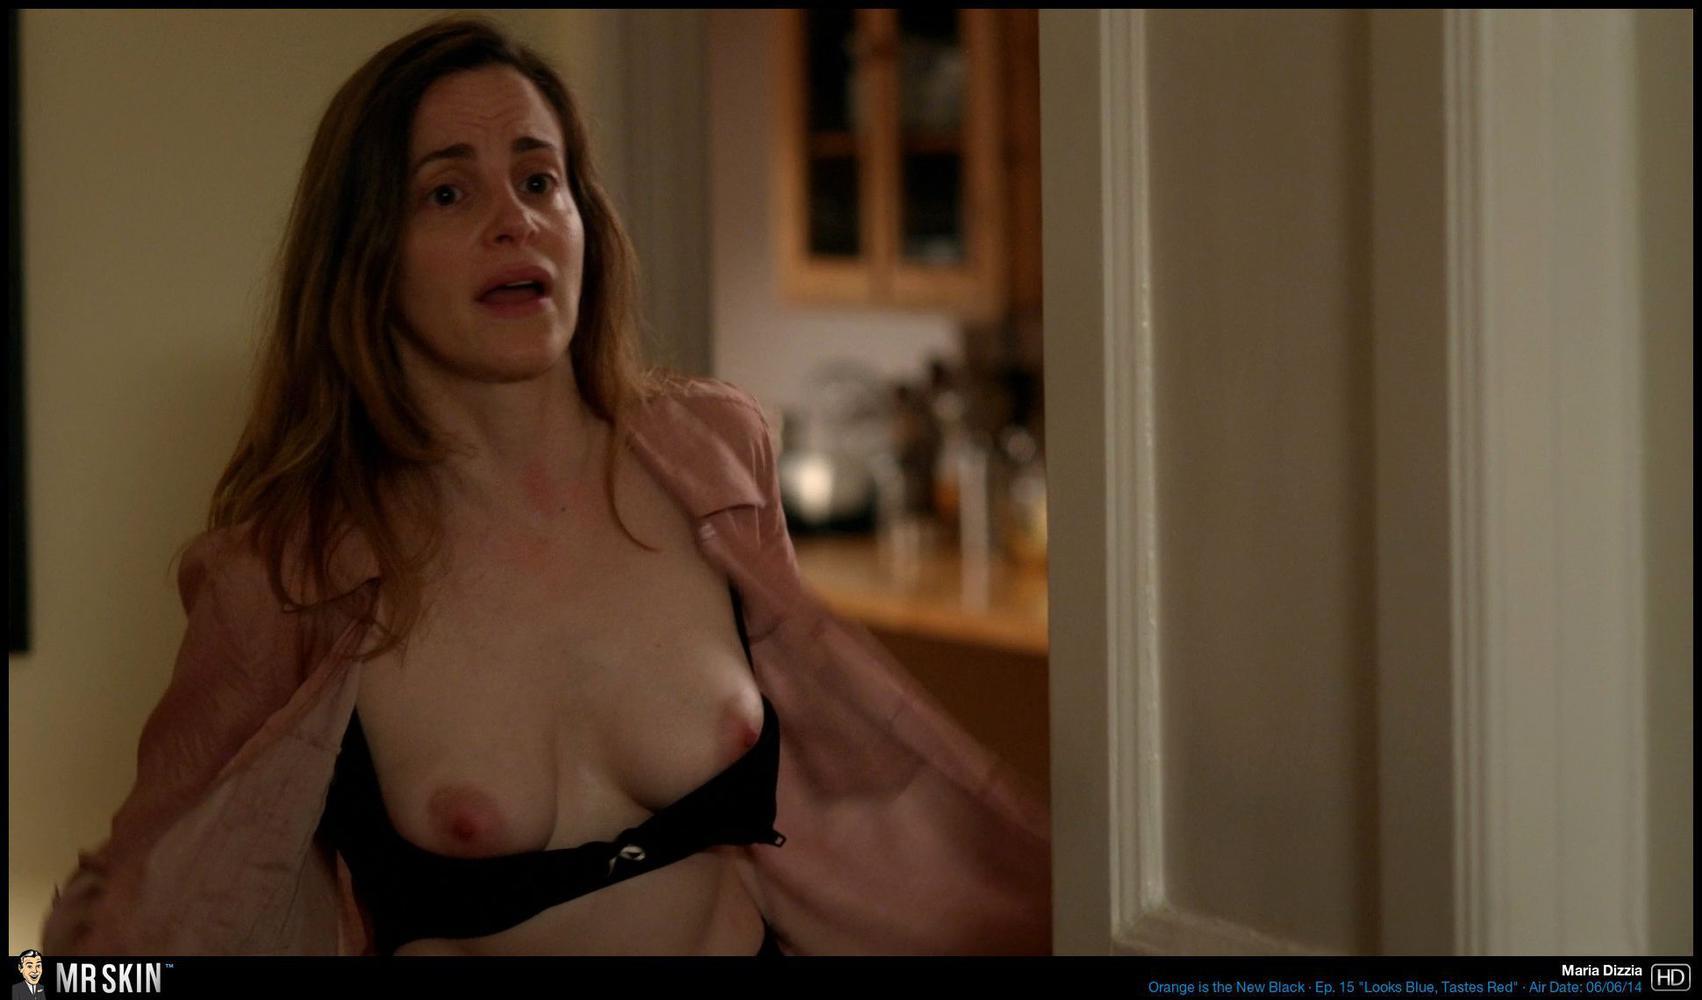 Nude Debra Wilson Star Trek Nude Png